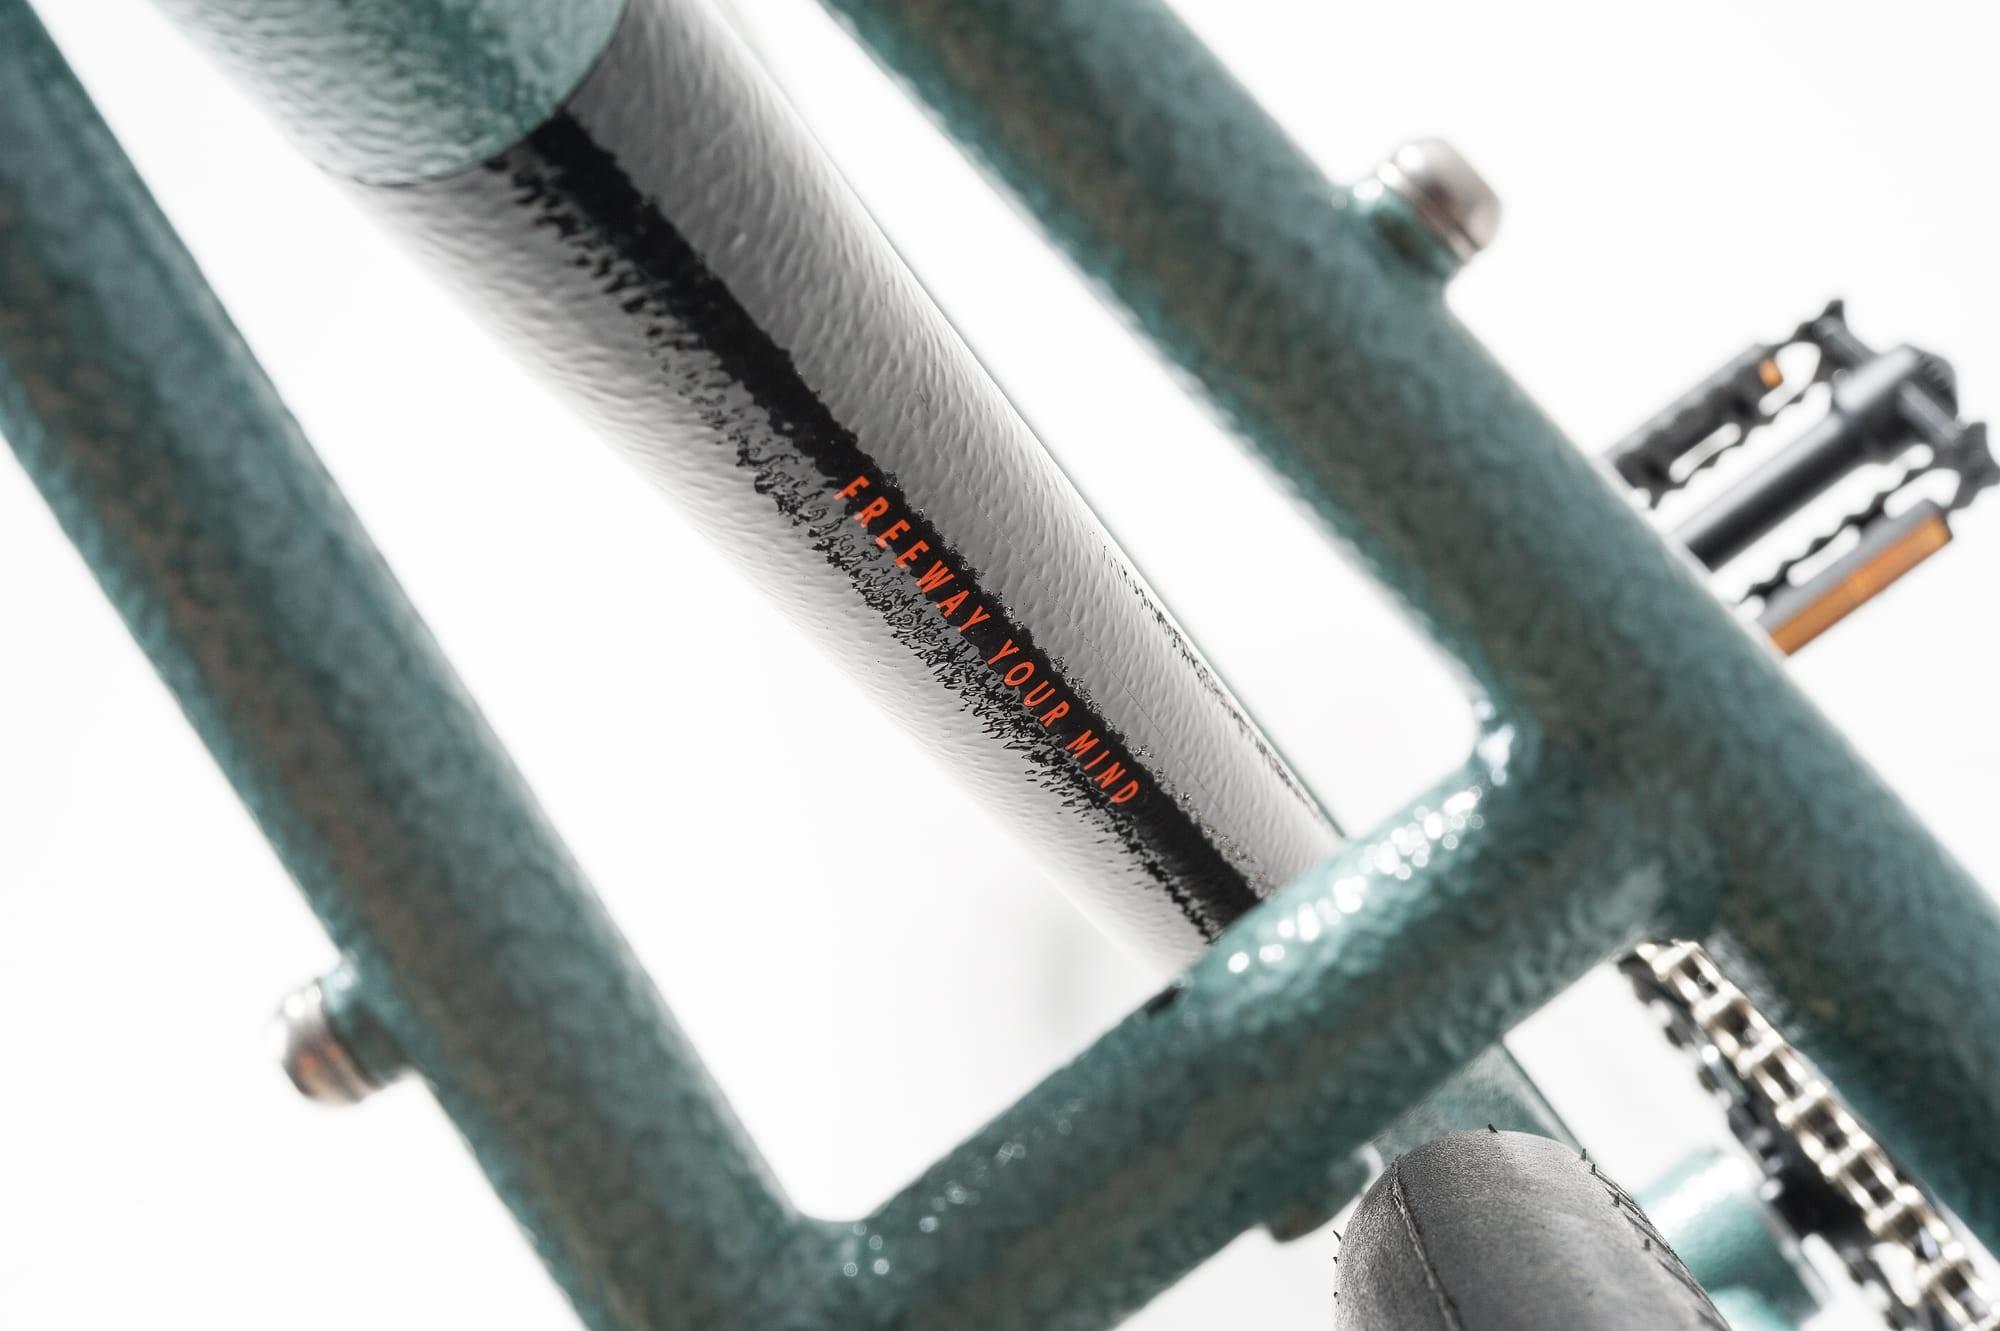 08_fw16_bike_details